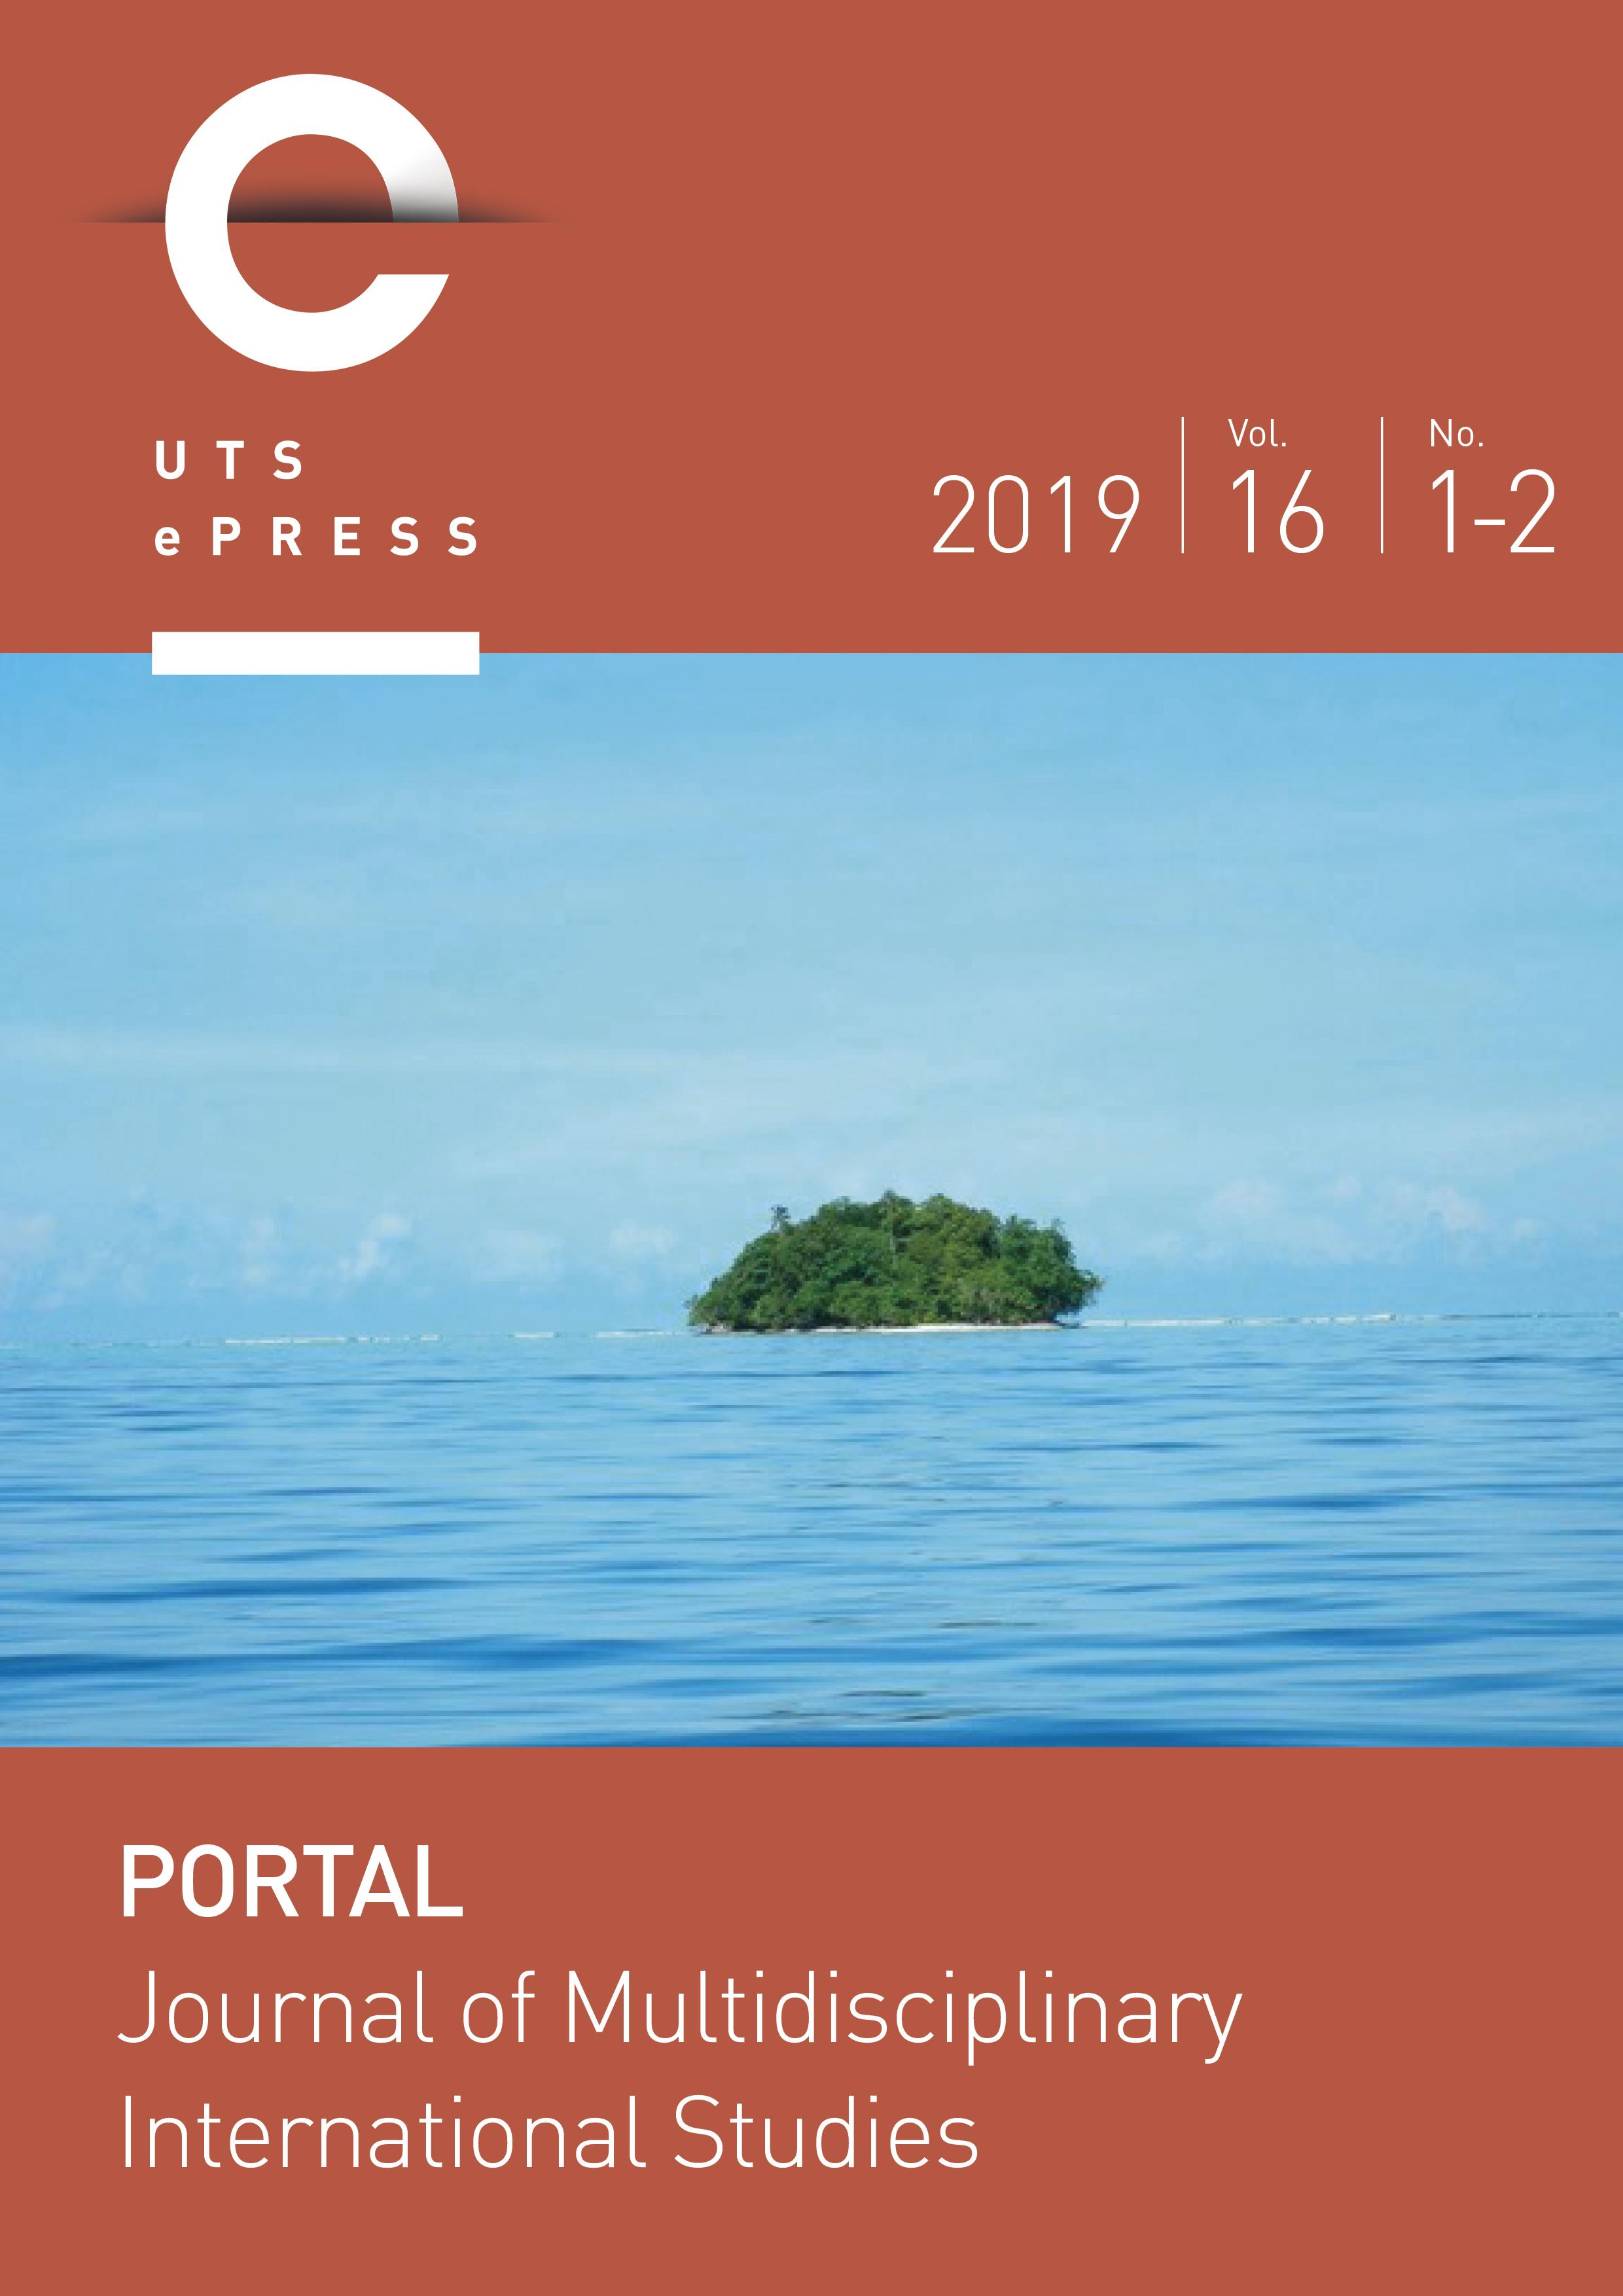 Image: Tumalulu Island, Western Province, Solomon Islands 2011 © Charles Hawksley